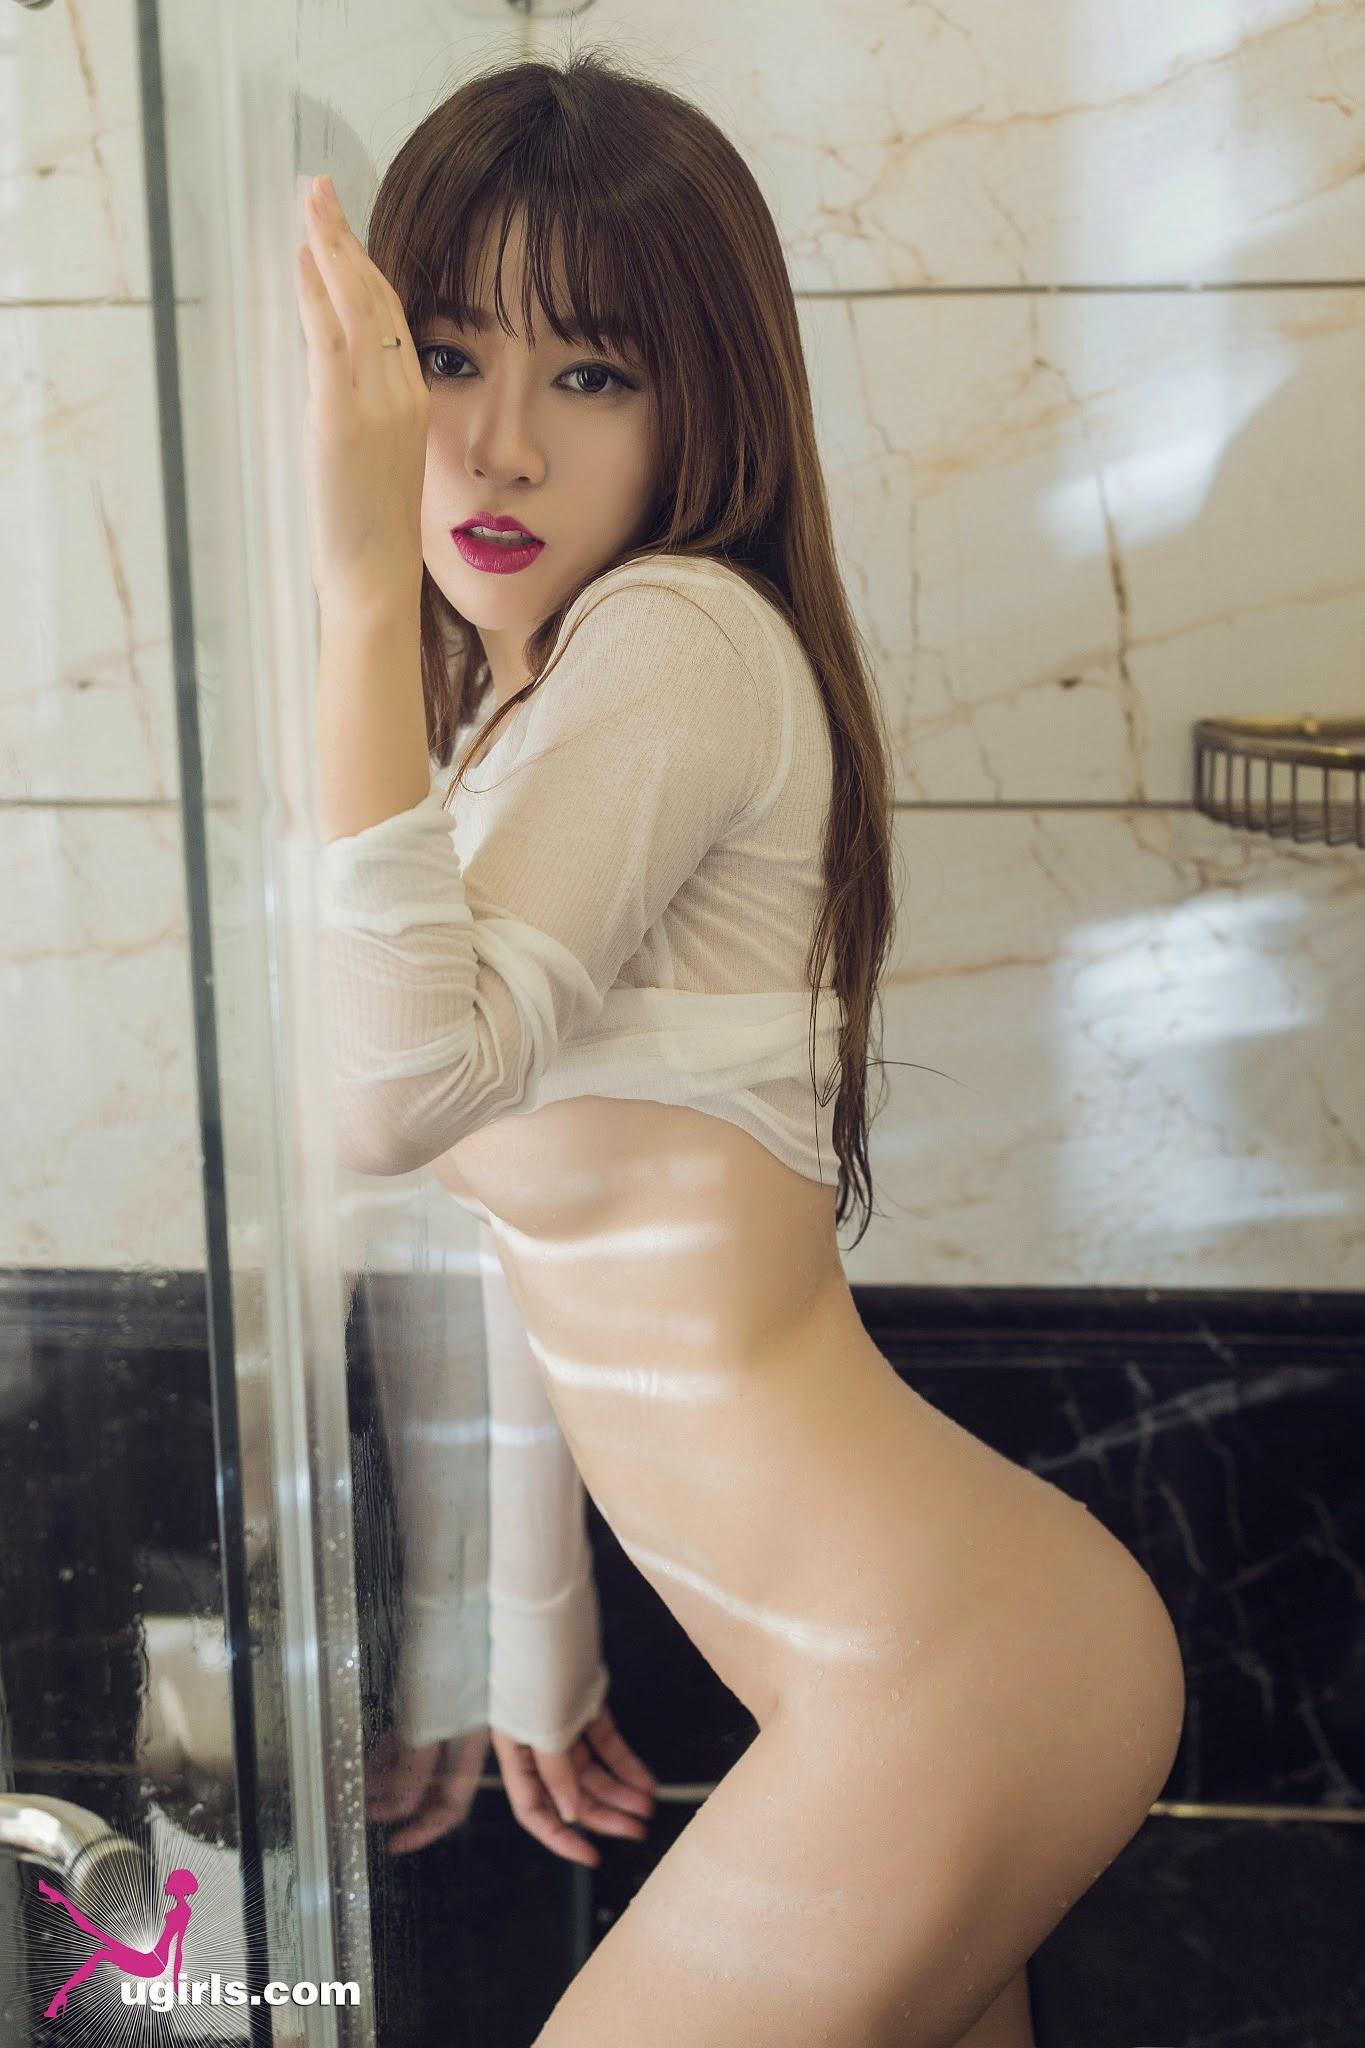 Wang Yu Chun 王语纯 [ugirls尤果] Original Nude Gallery